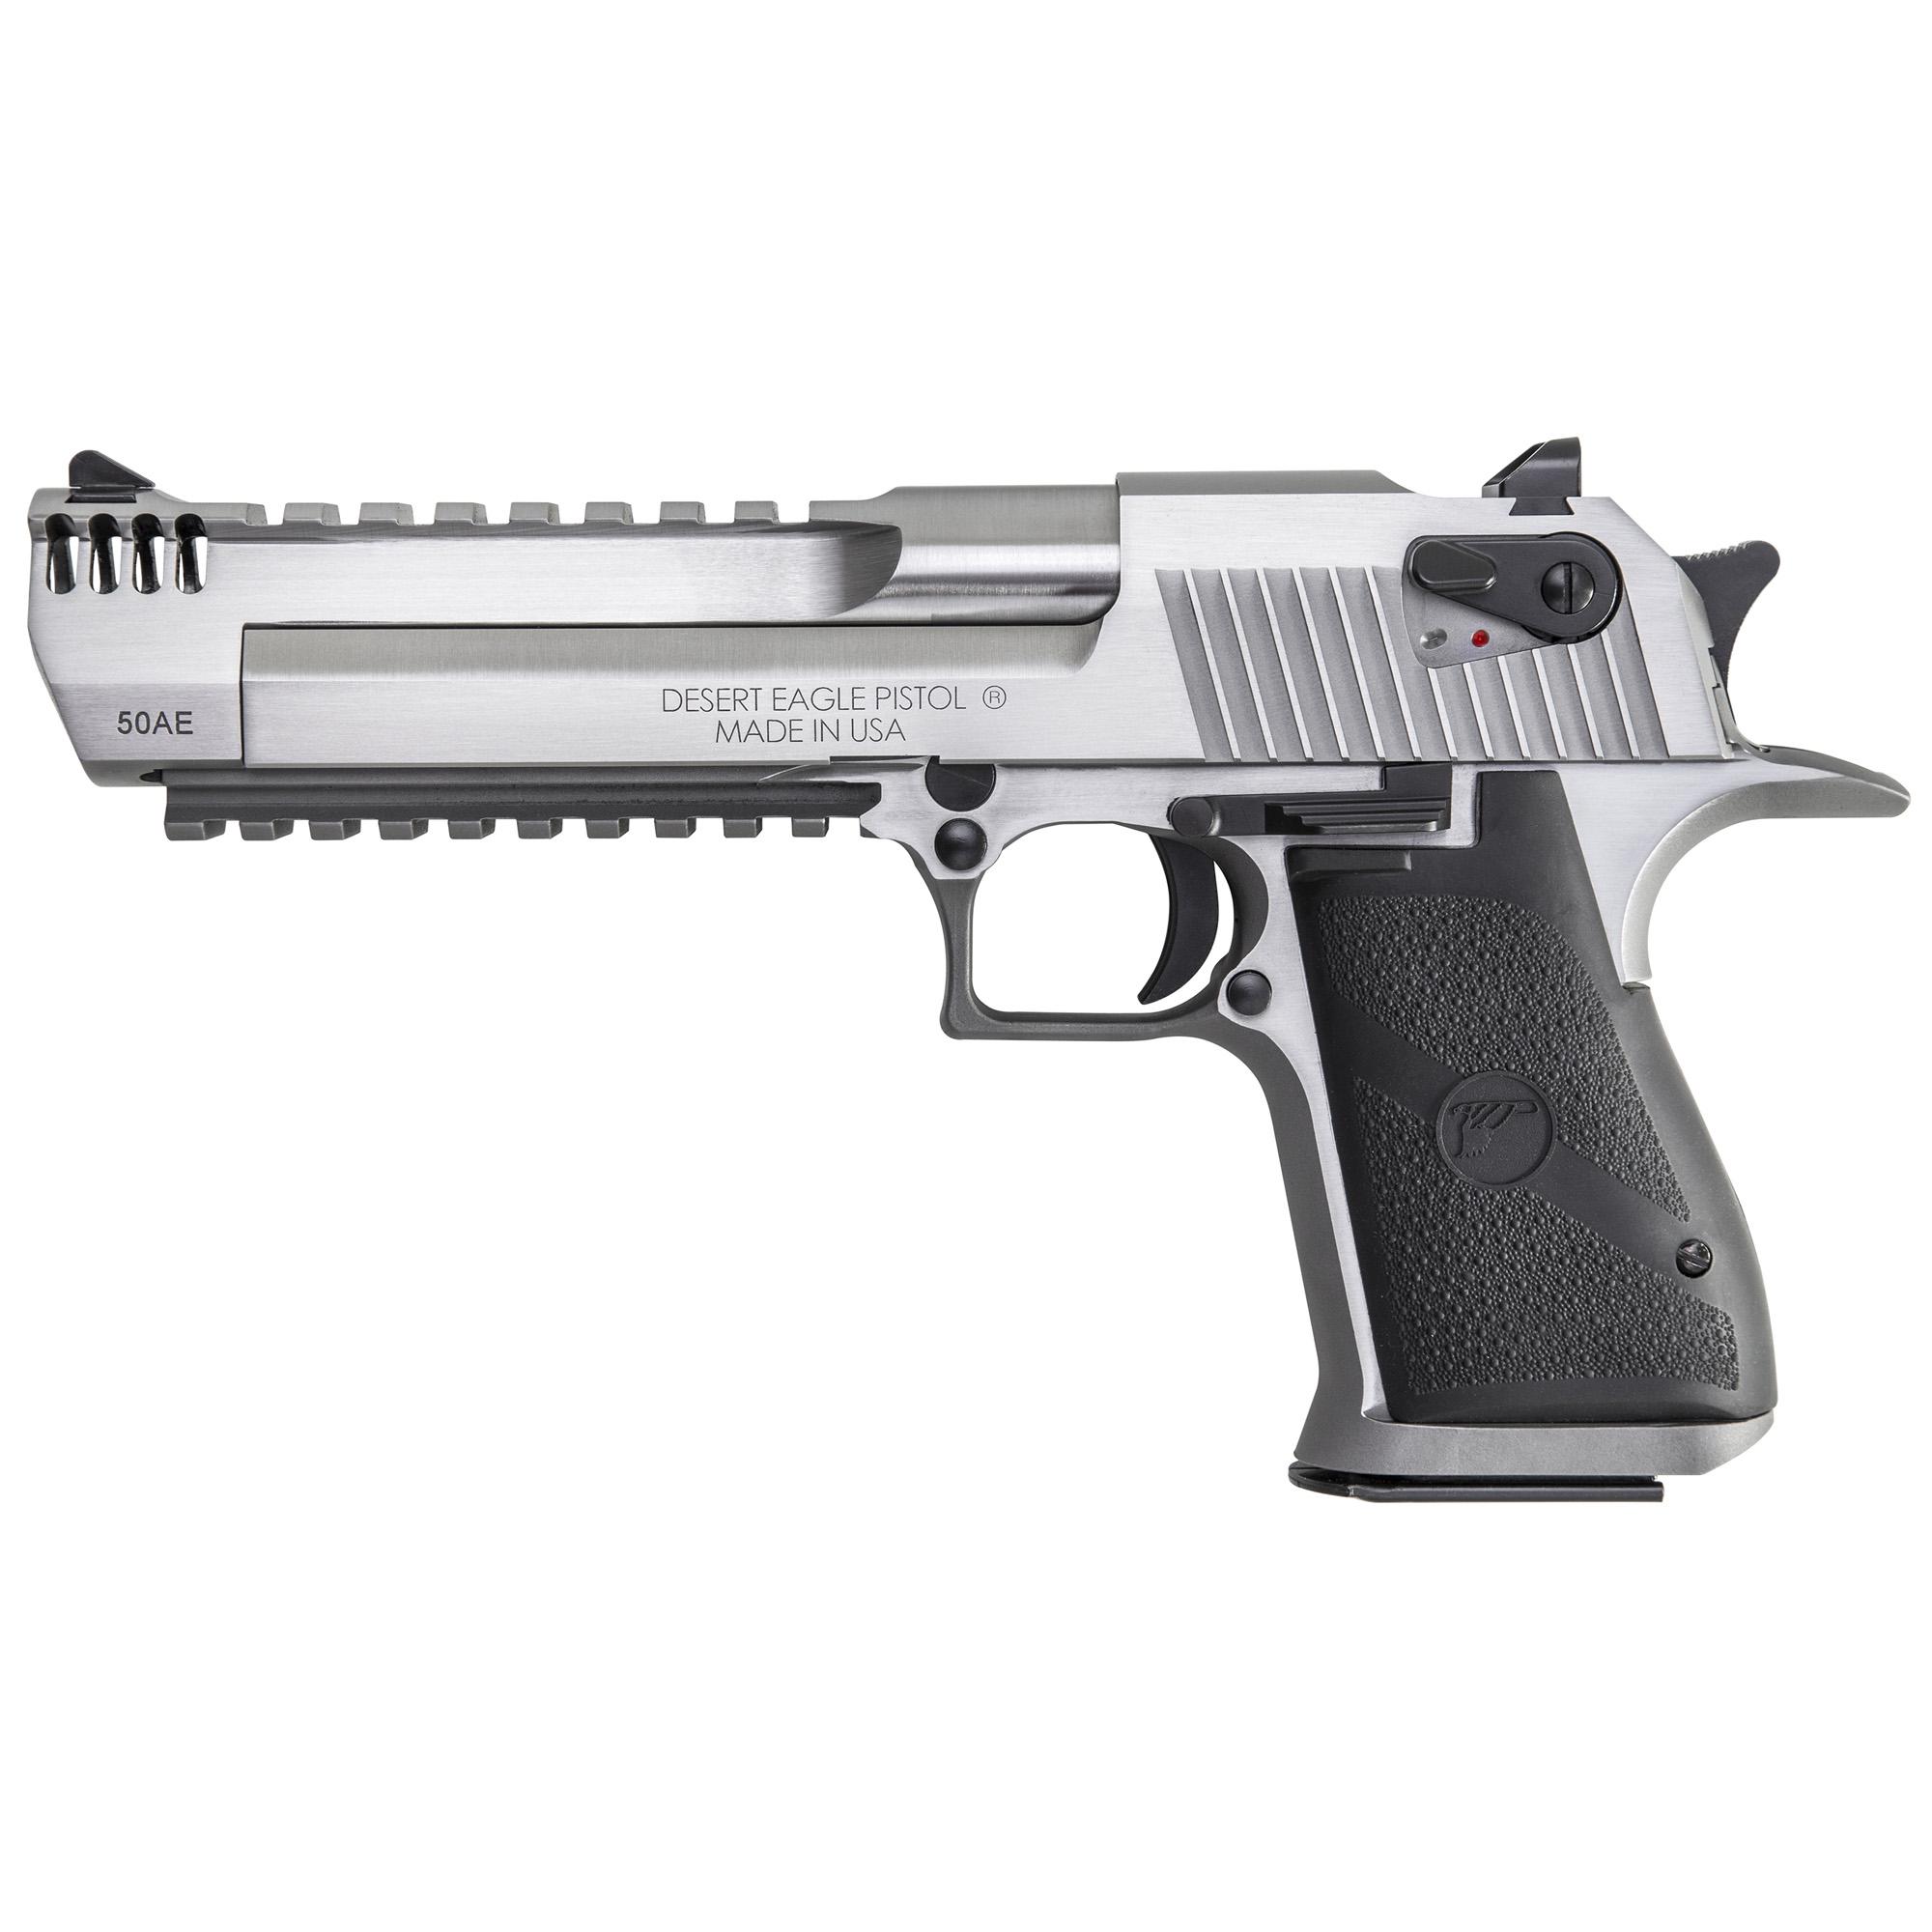 "Desert Eagle(R) Mark XIX Pistol"" Stainless Steel with Picatinny Bottom Rail"" Weaver Style Top Rail"" Integral Muzzle Brake"" Black Appointments"